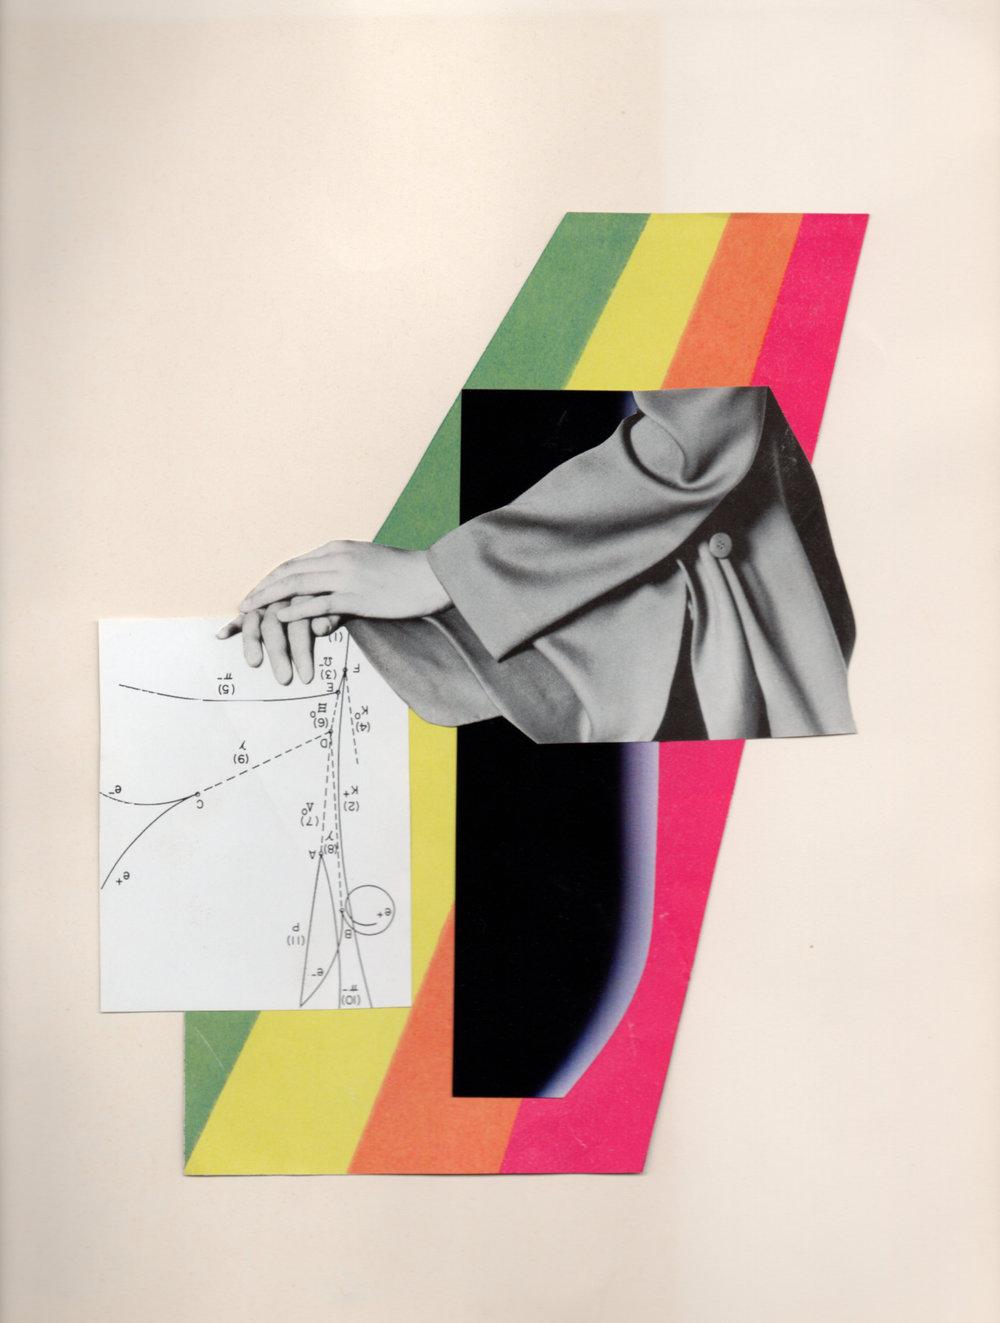 Untitled, 2105, 24 x 32 cm